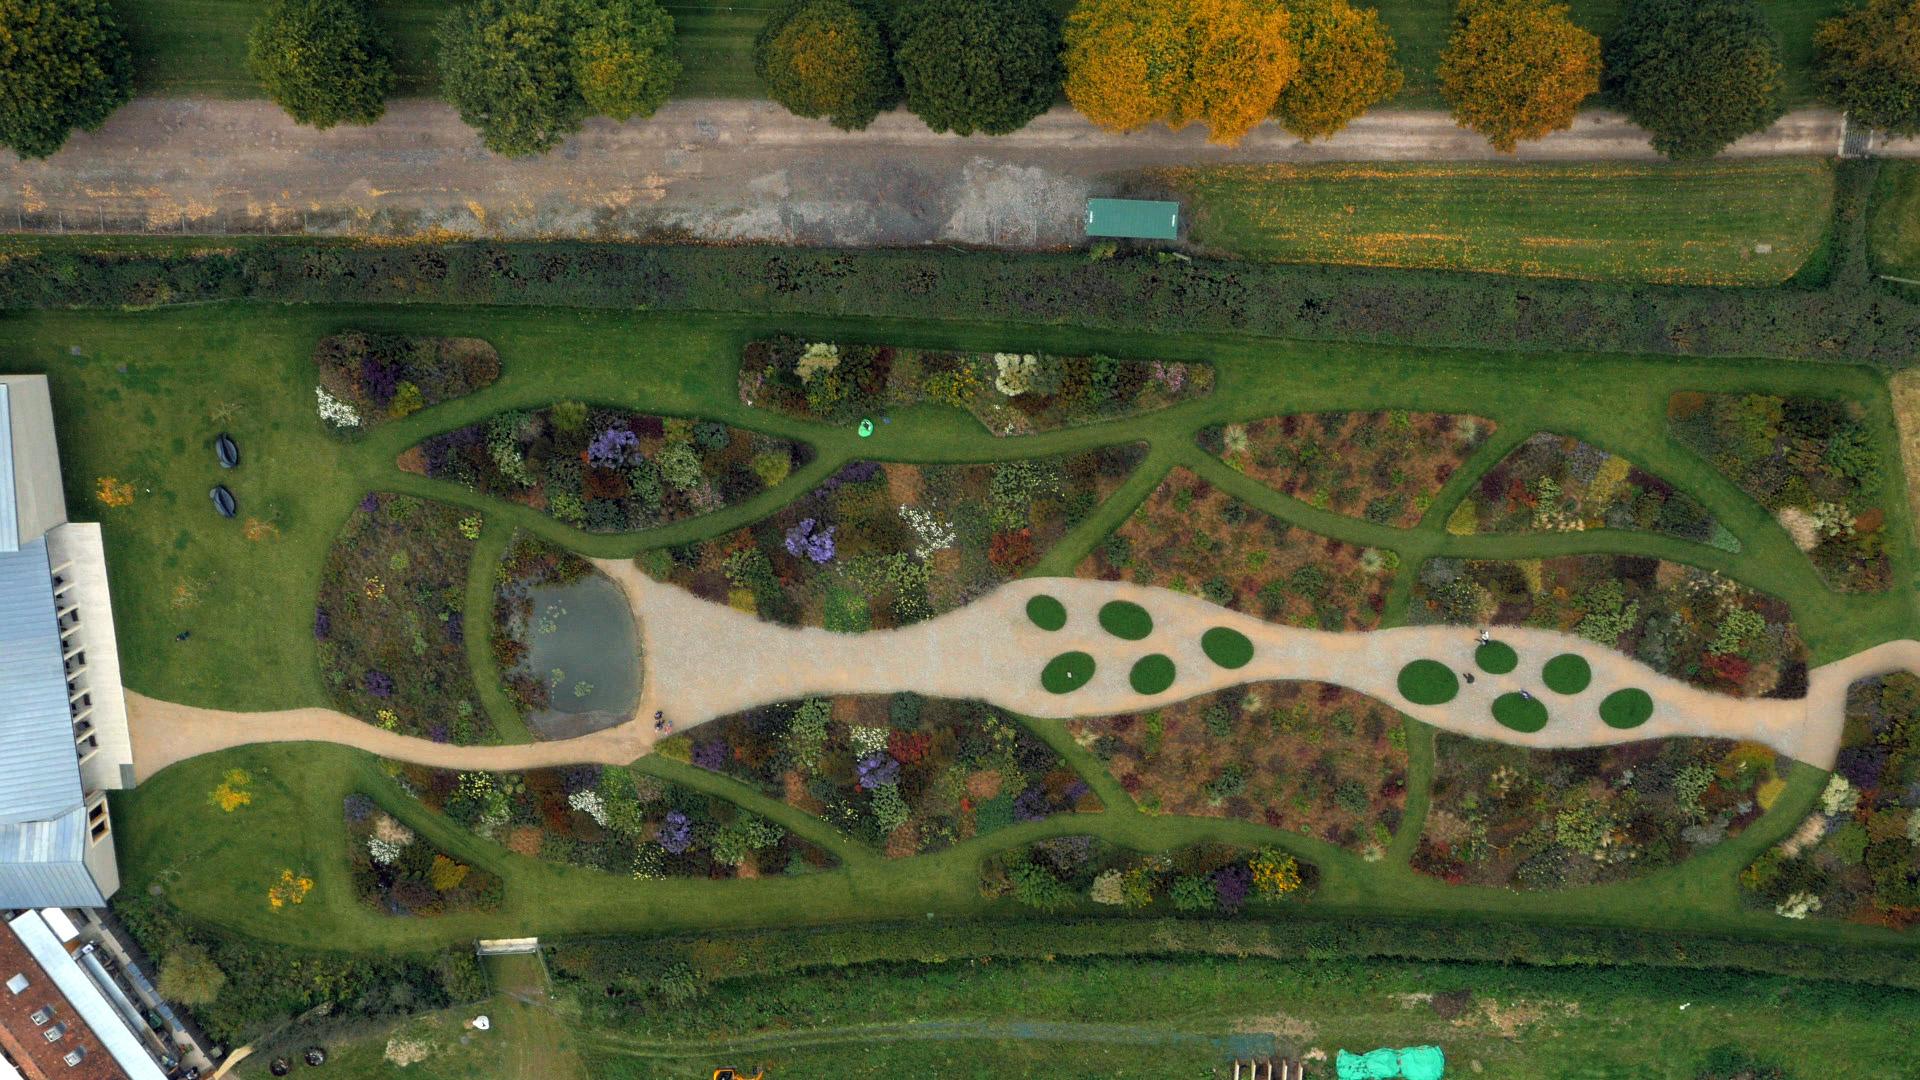 Five Seasons The Gardens Of Piet Oudolf